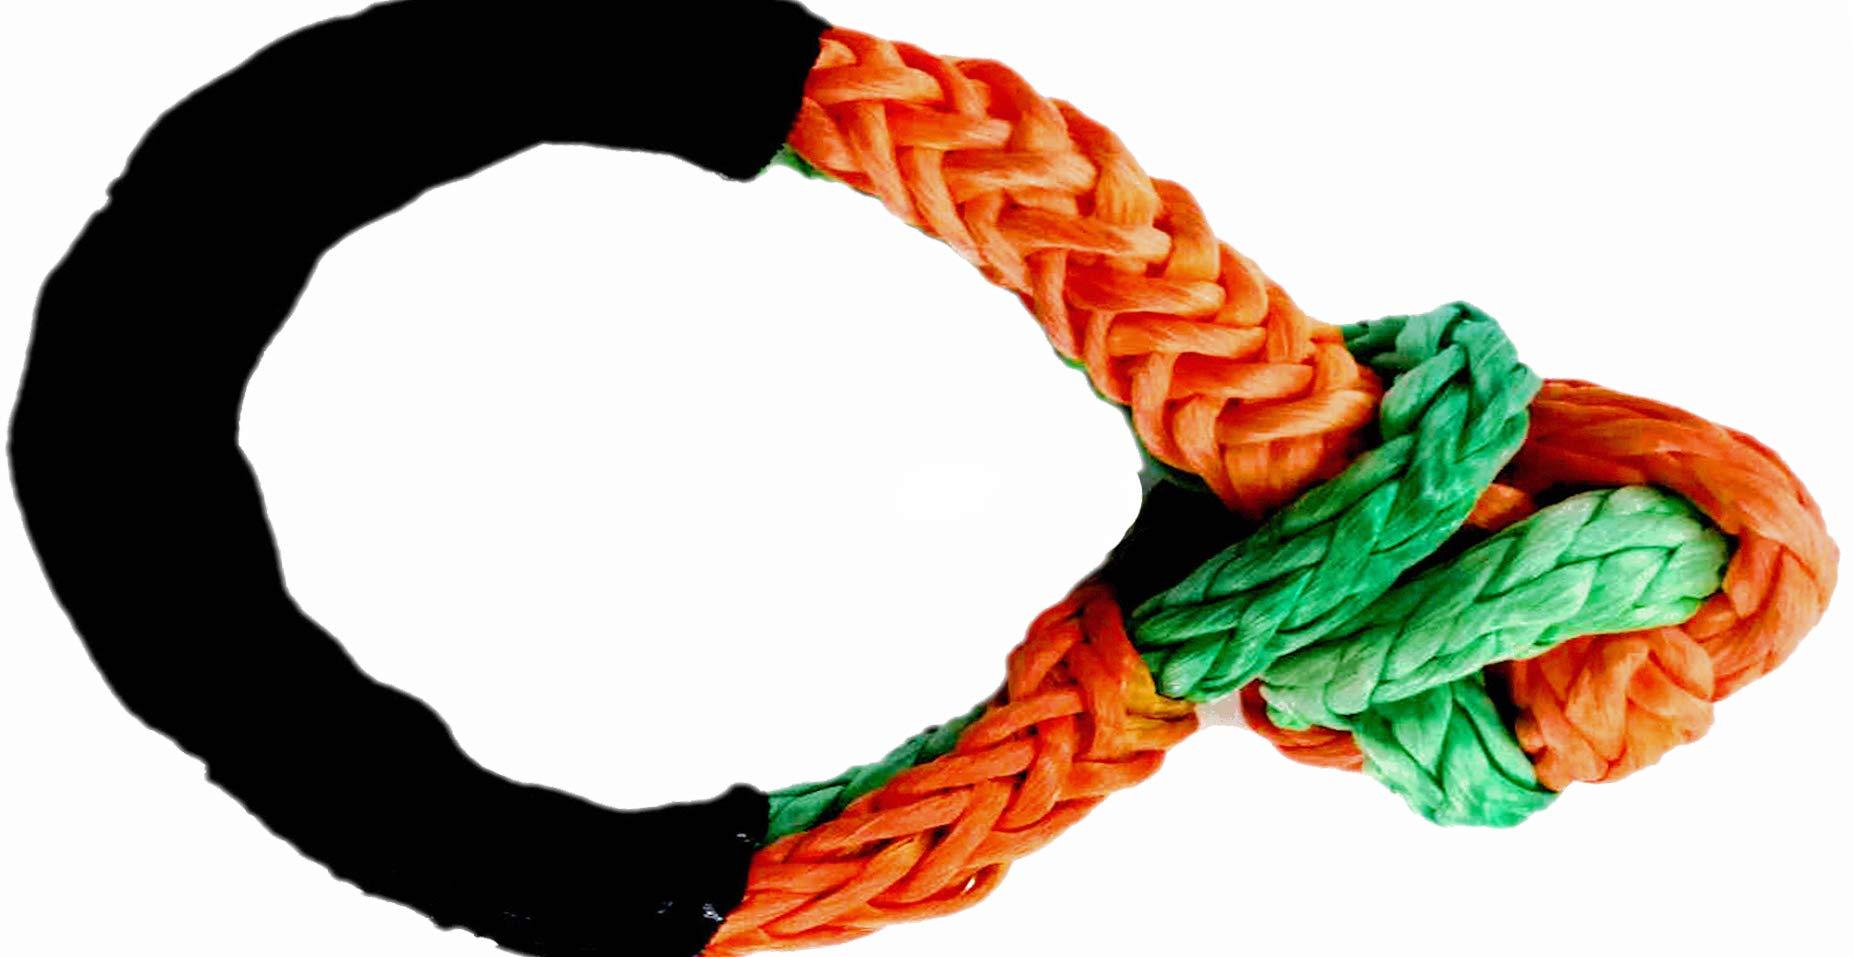 Jutemill Soft Shackle 7/16 by AAYU | 6'' Loop| Breaking Strength 34000 LBS| Apt for Heaving Handling: Recovery, ATV/UTV, Marine Craft| Green & Orange, Winch Bumper Shackle ATV Winch Shackle by Jutemill